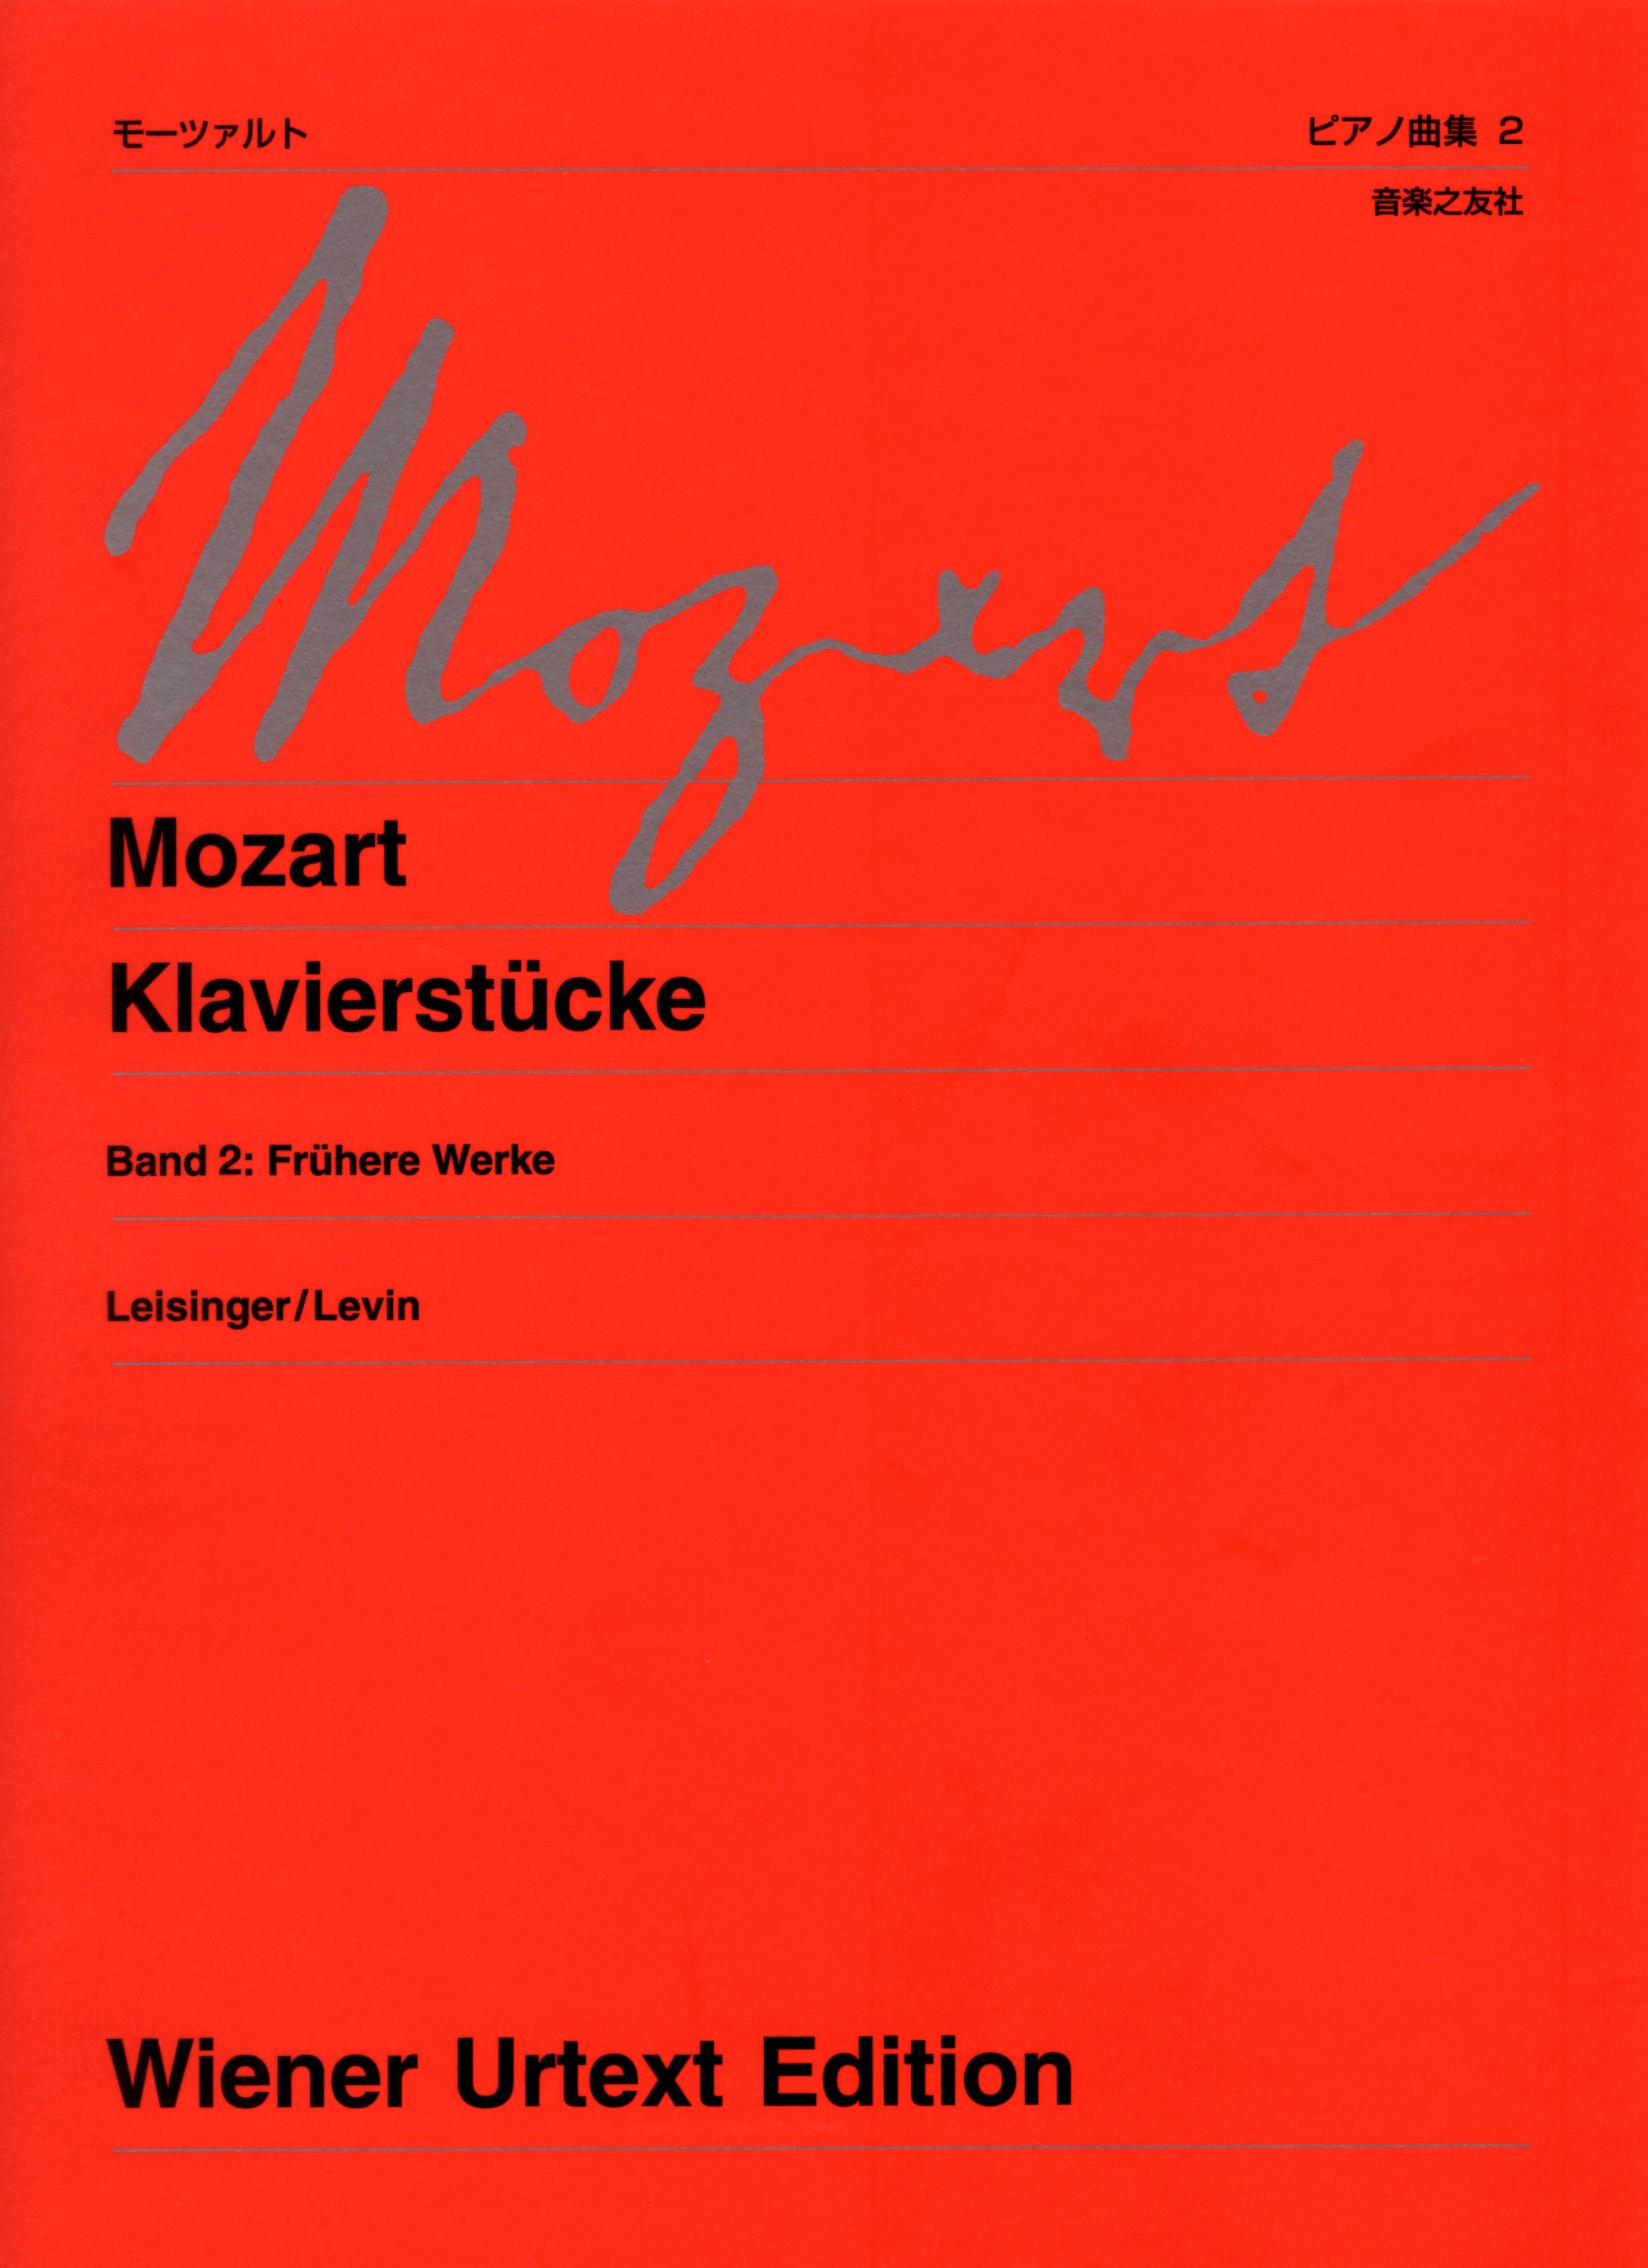 【鋼琴獨奏樂譜】維也納原典版 莫札特 鋼琴作品 第二冊: 早期作品 MOZART Klavierstucke Band 2: frugere werke ウィーン原典版 229b ピアノ曲集 2